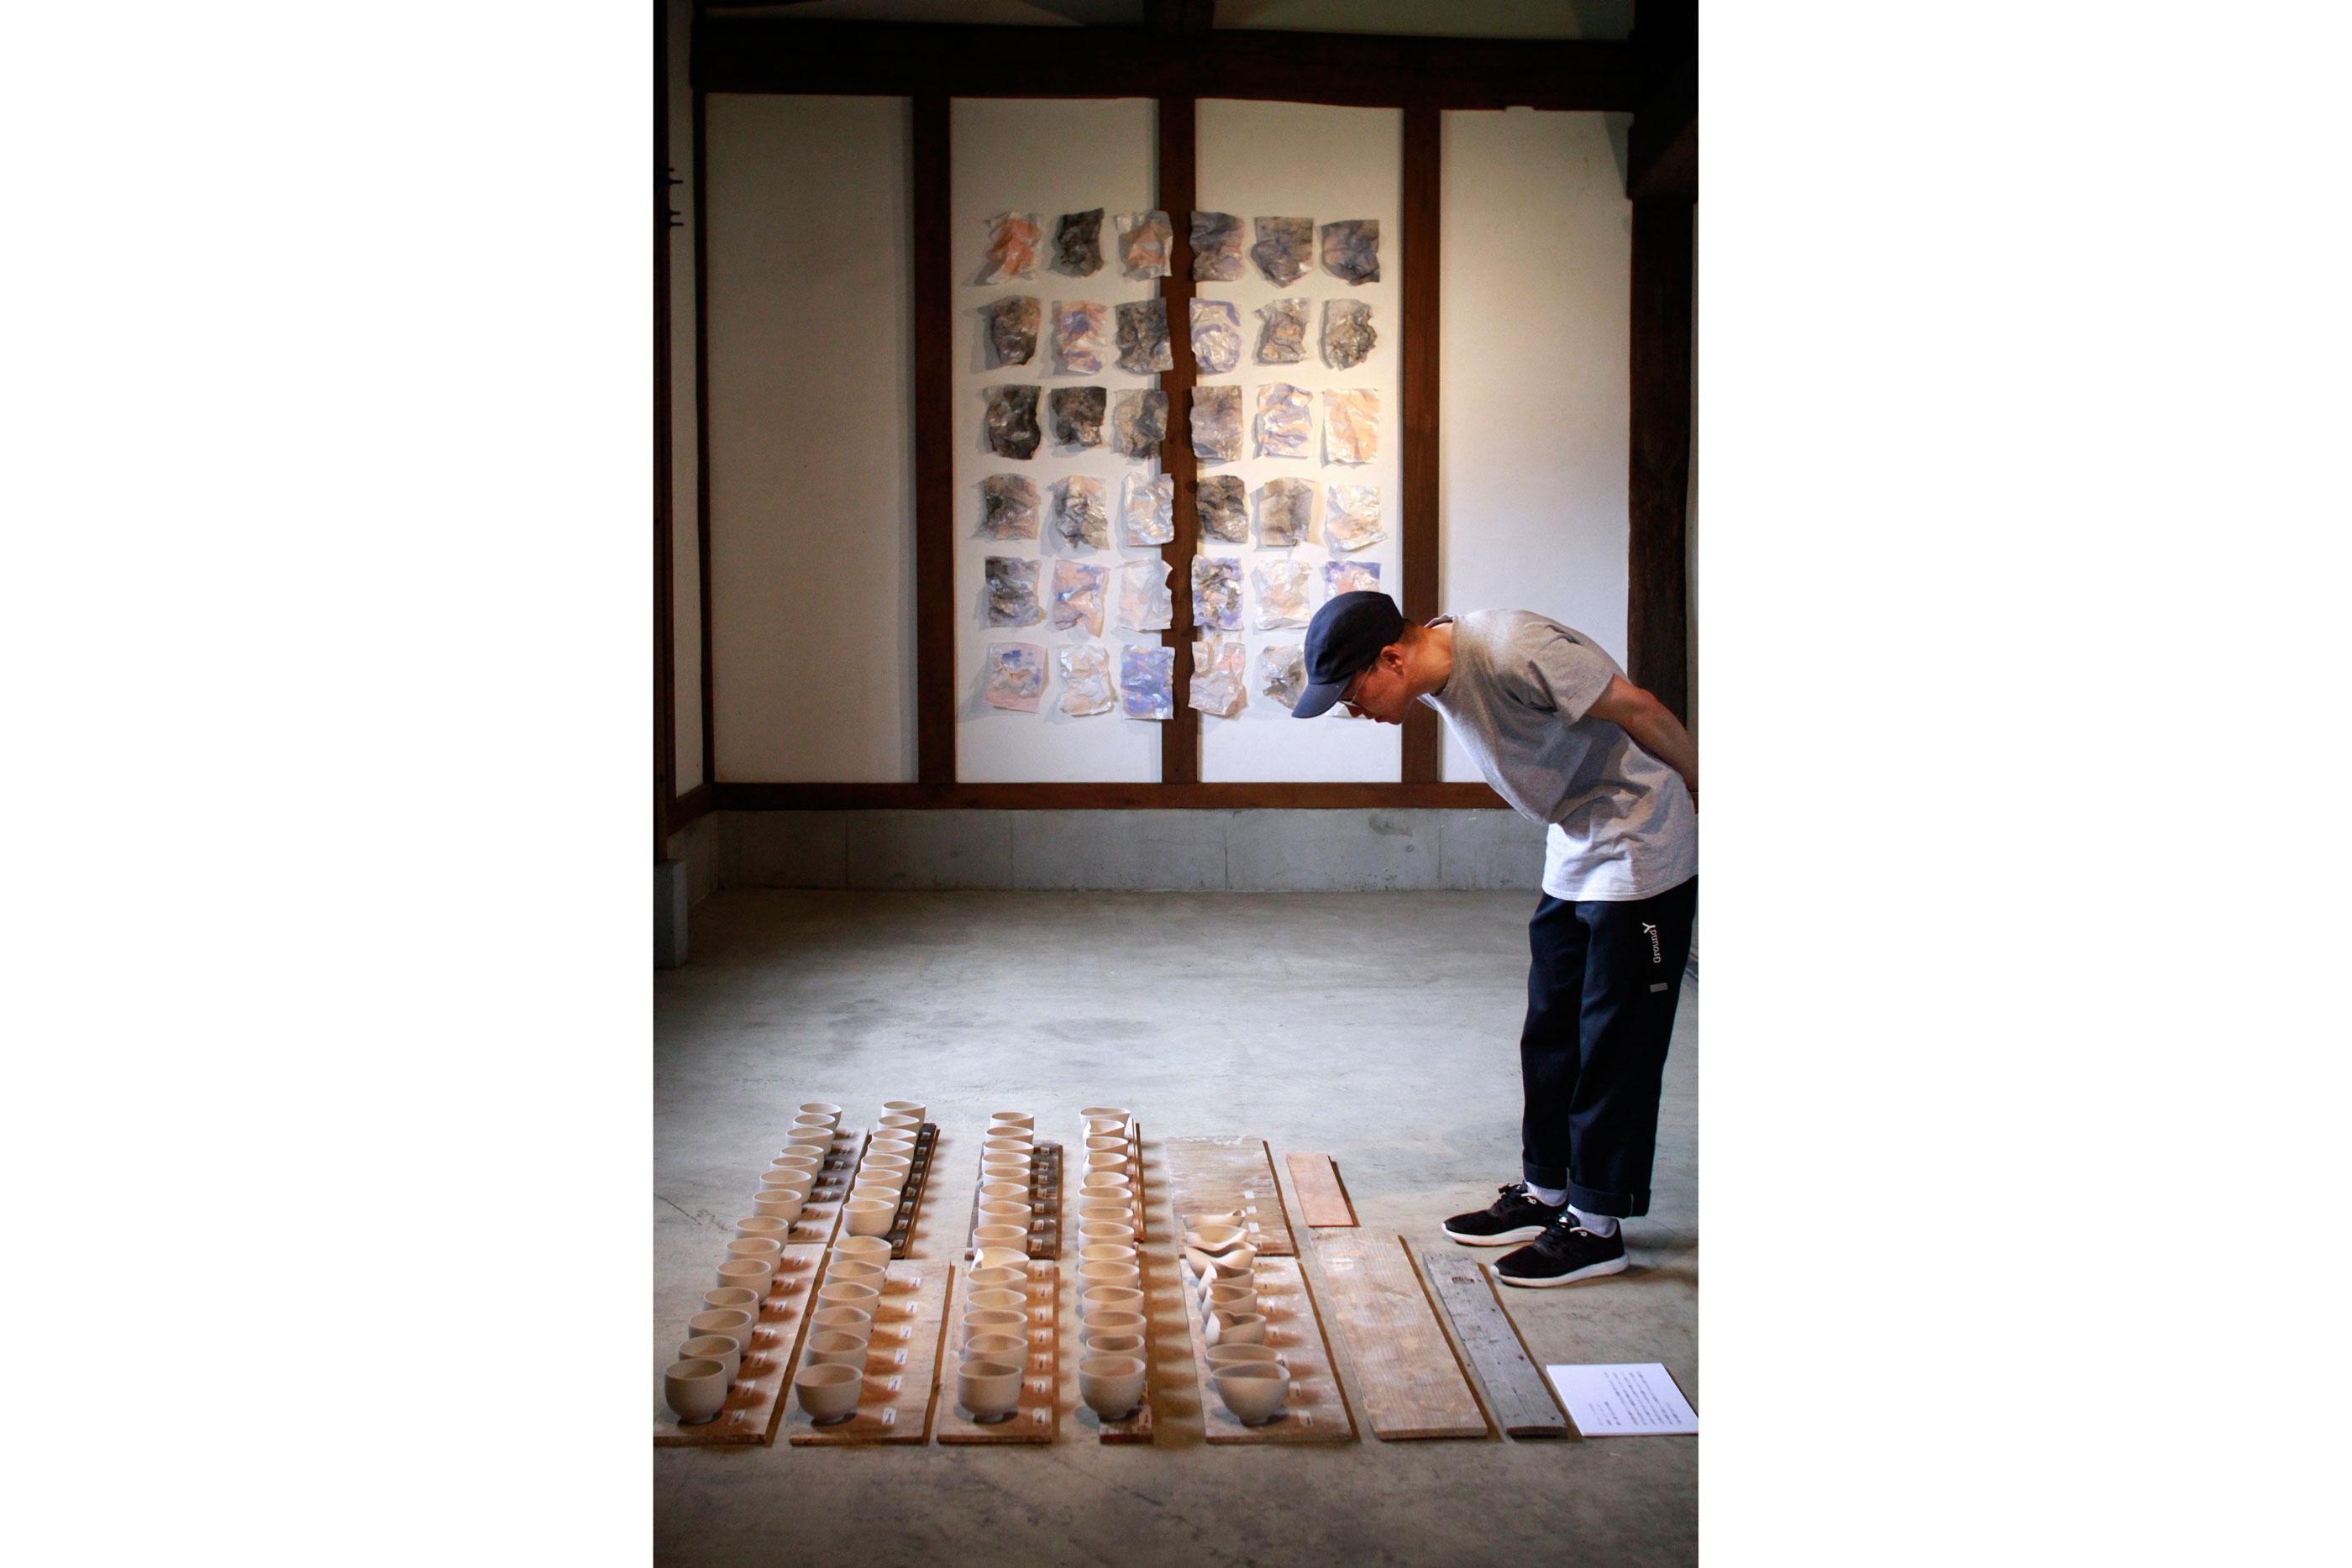 Japan Art Exhibition Shiro Oni Studio Art Residency シロオニスタジオの展覧会 2017 June Lena Kaapke